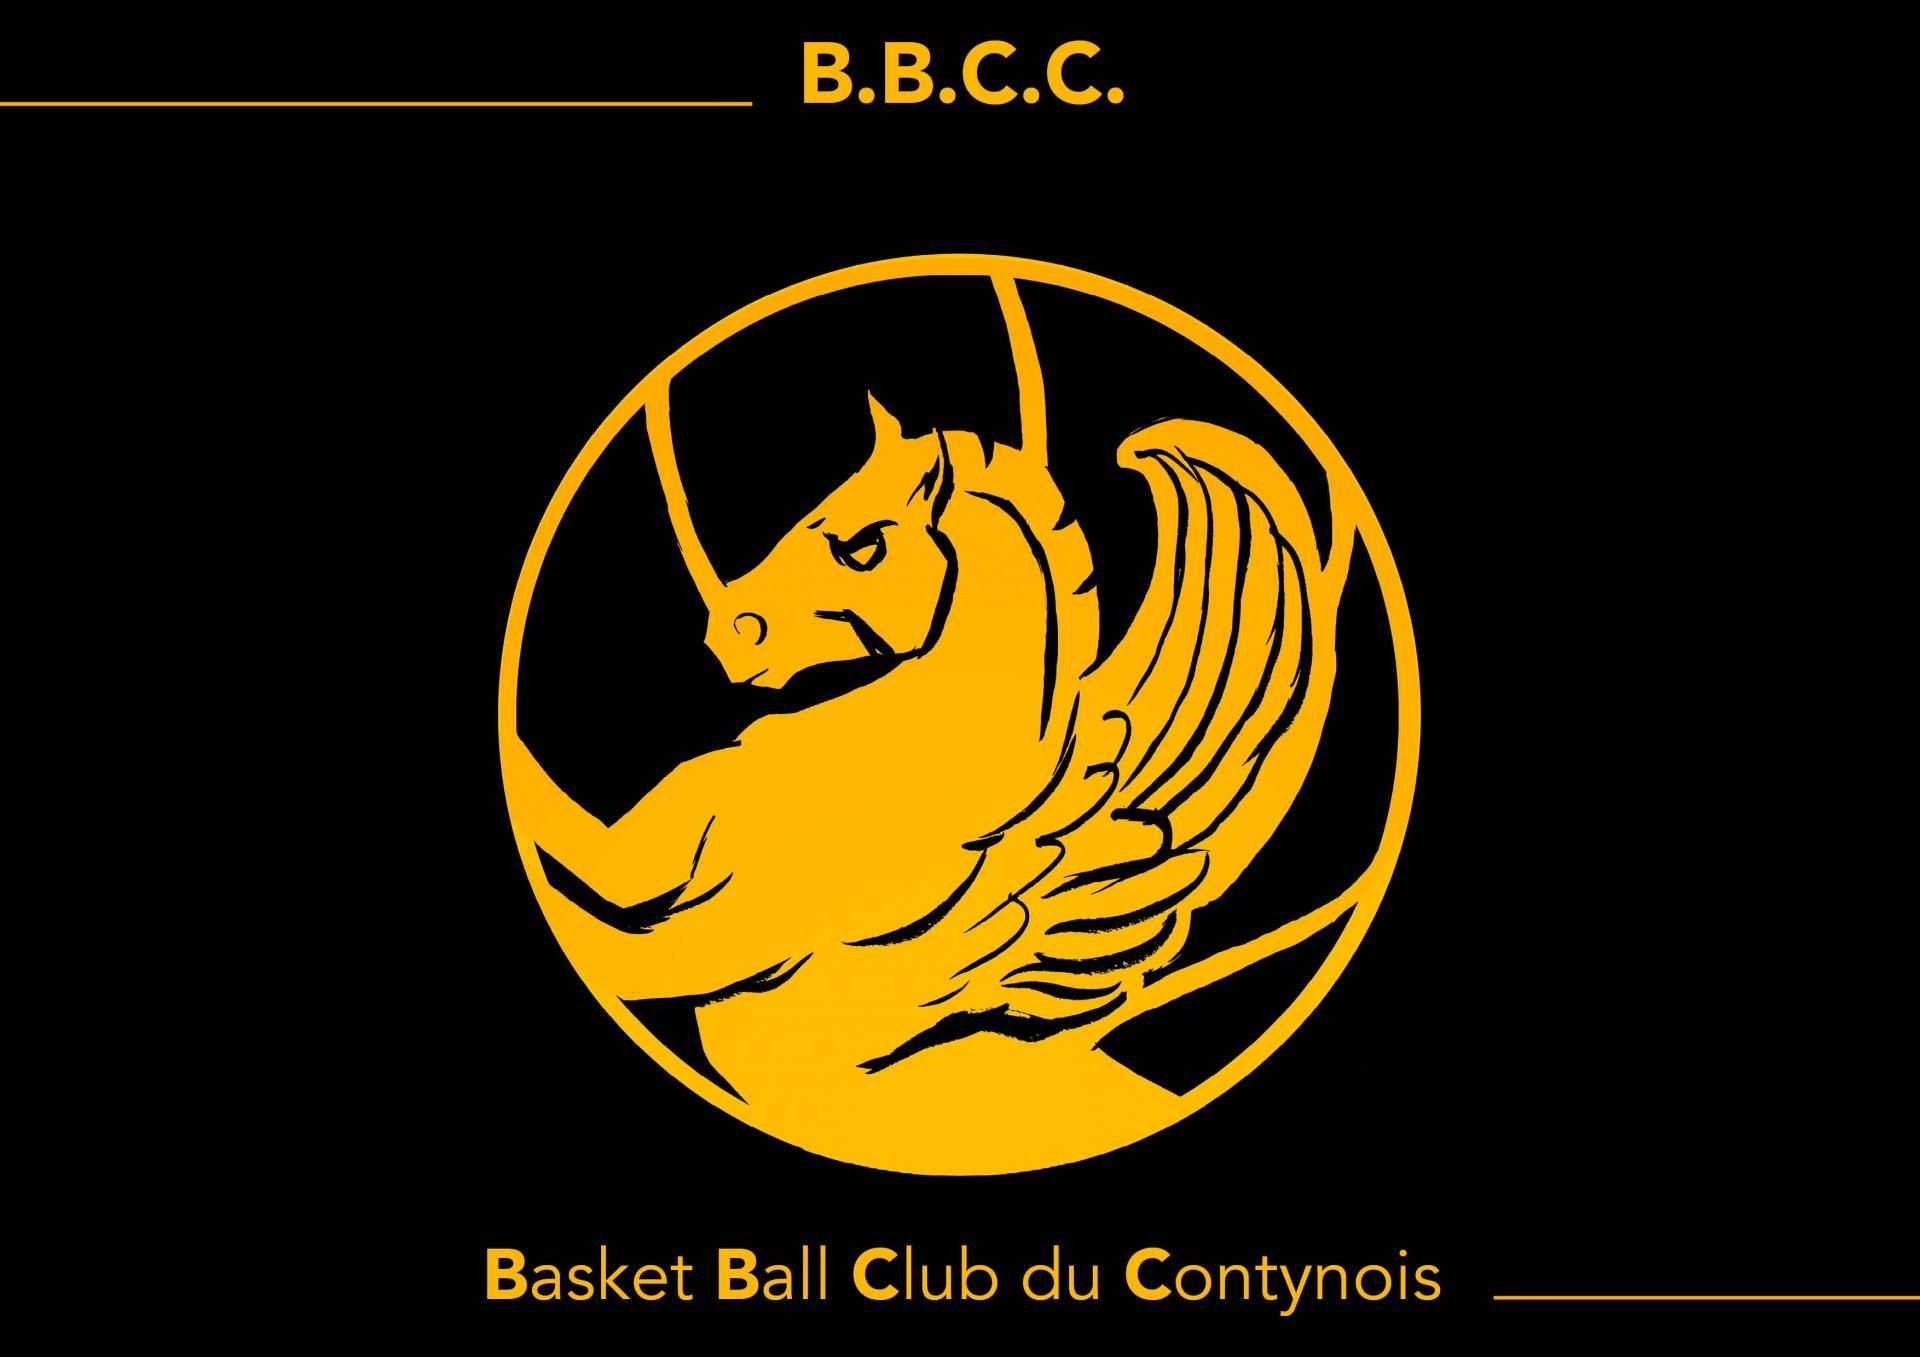 Fond d'écran du B.B.C.C.